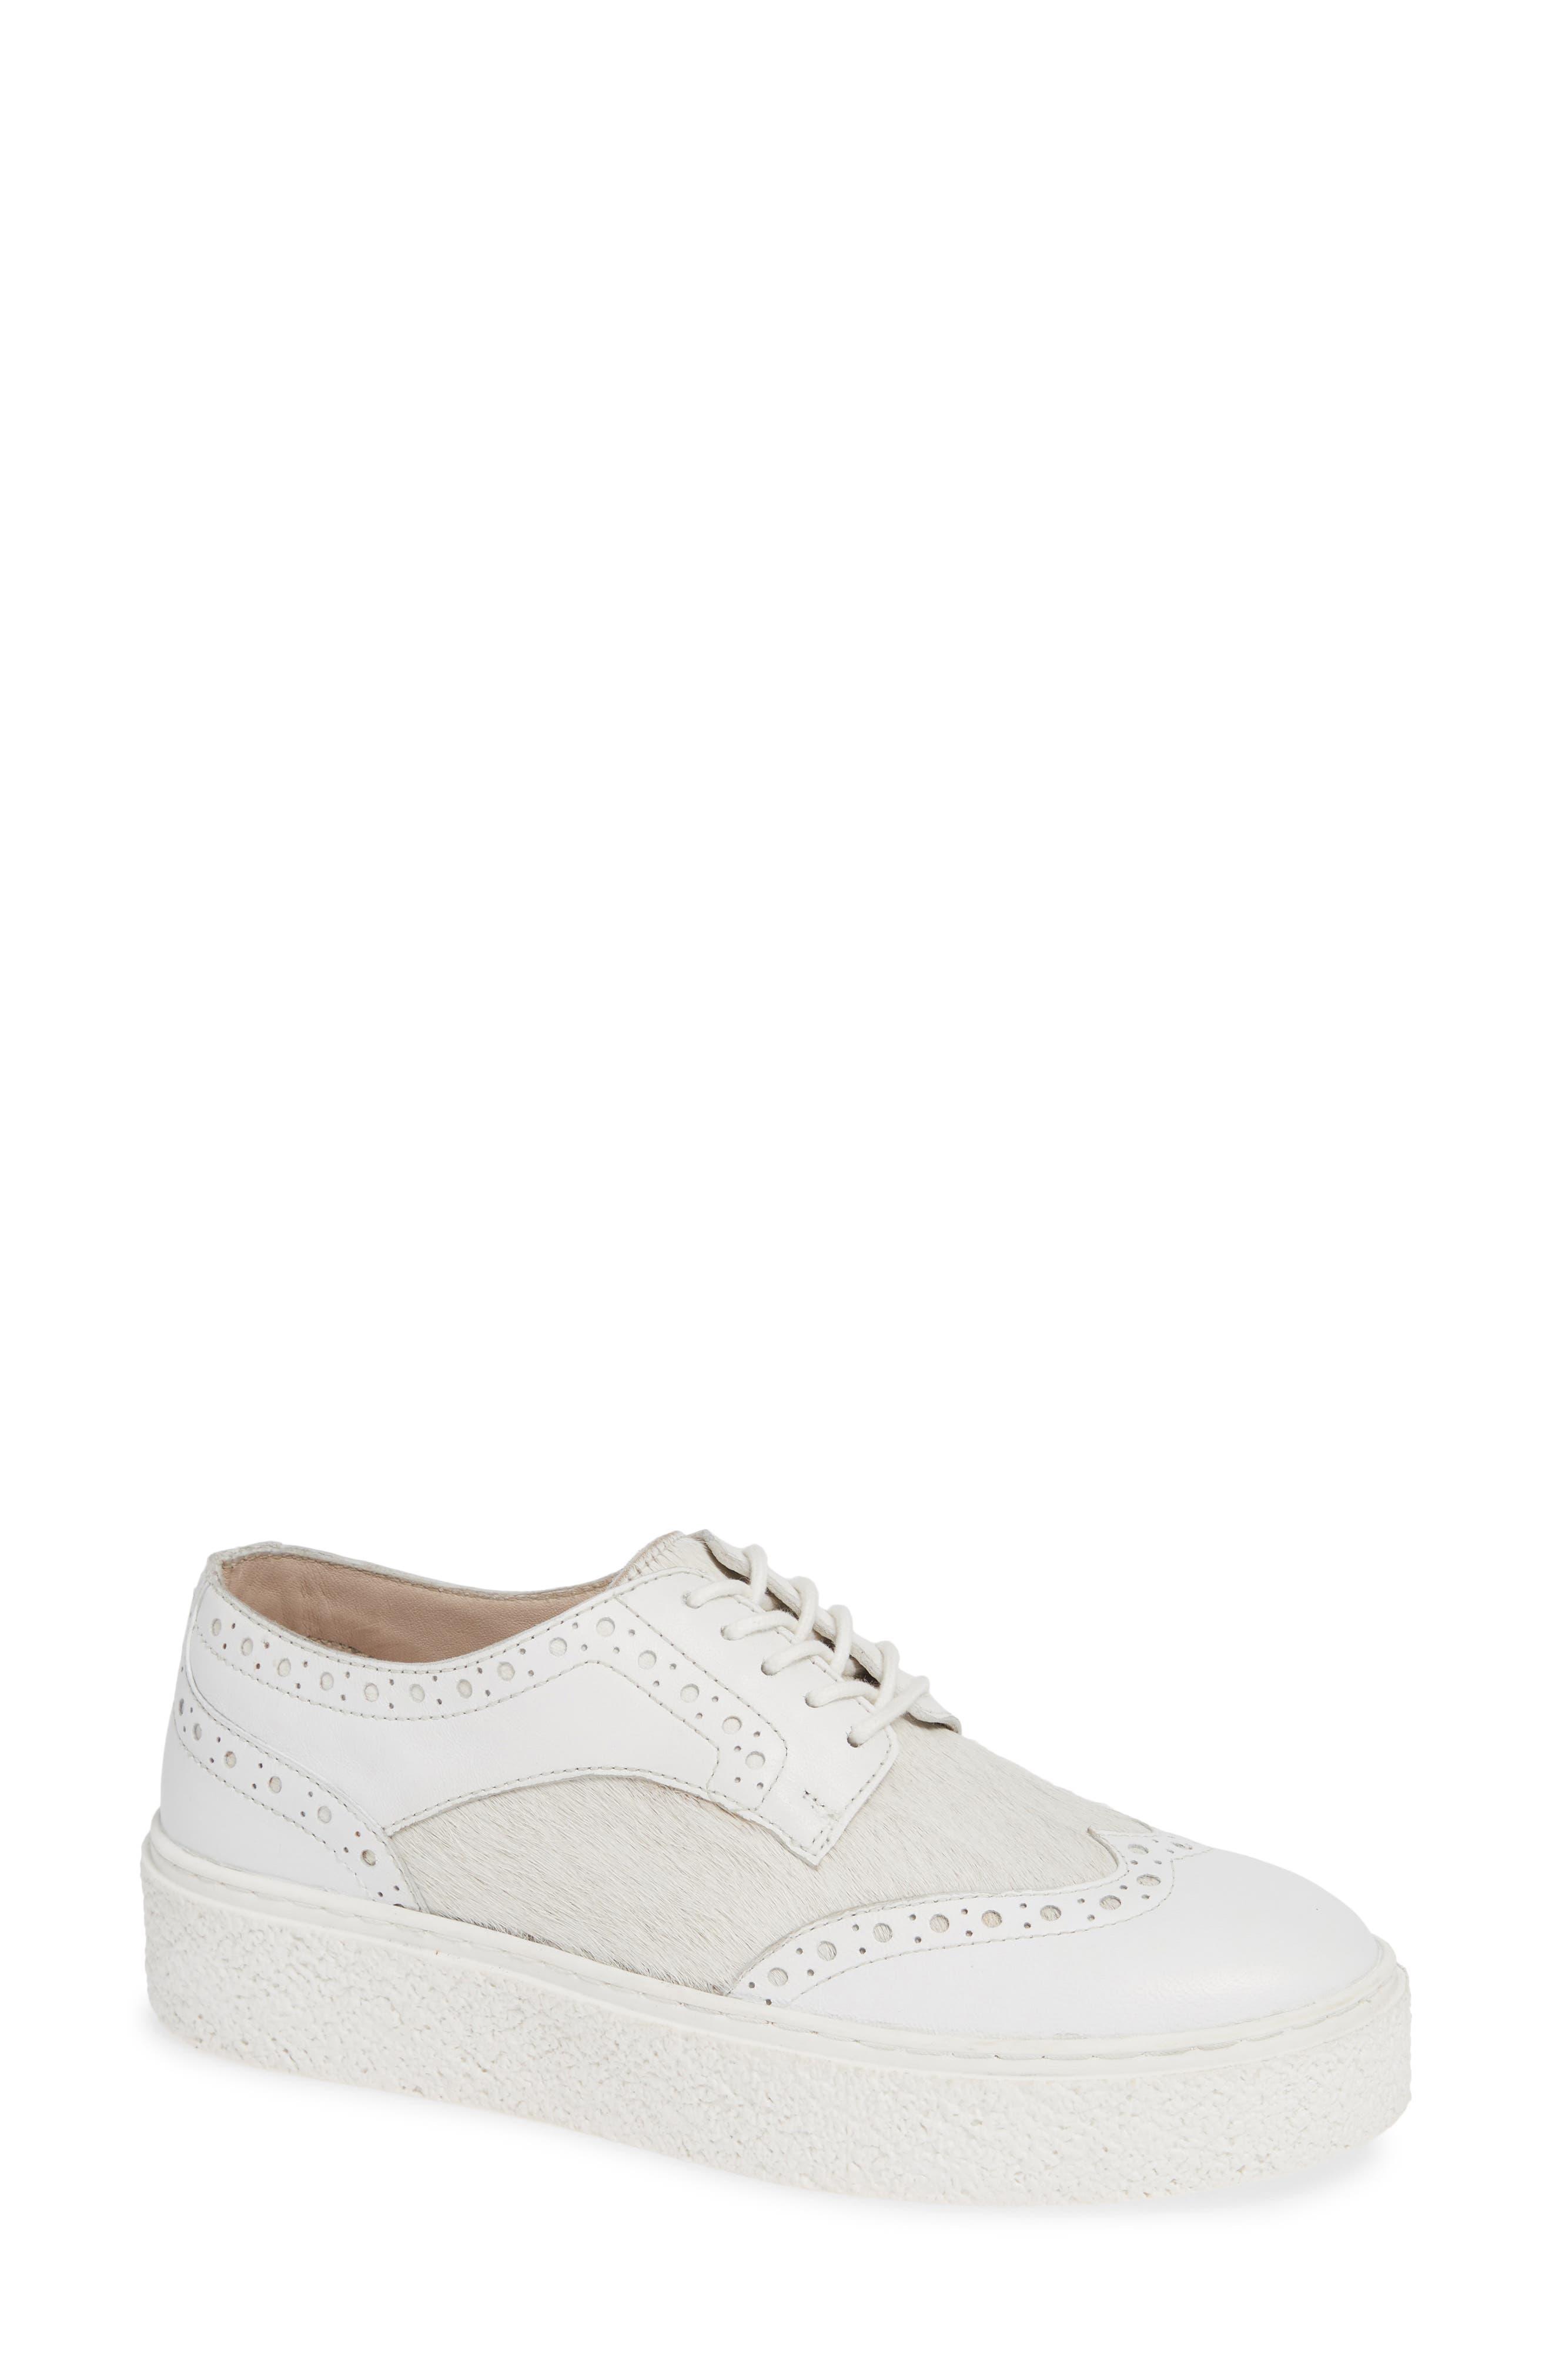 Seychelles Ideal Platform Sneaker, White